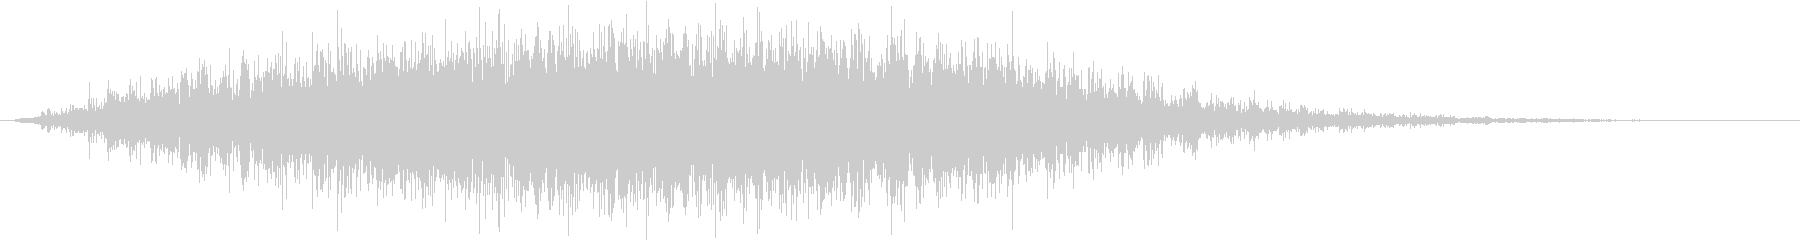 SpecialFx EC07_95_4の未再生の波形